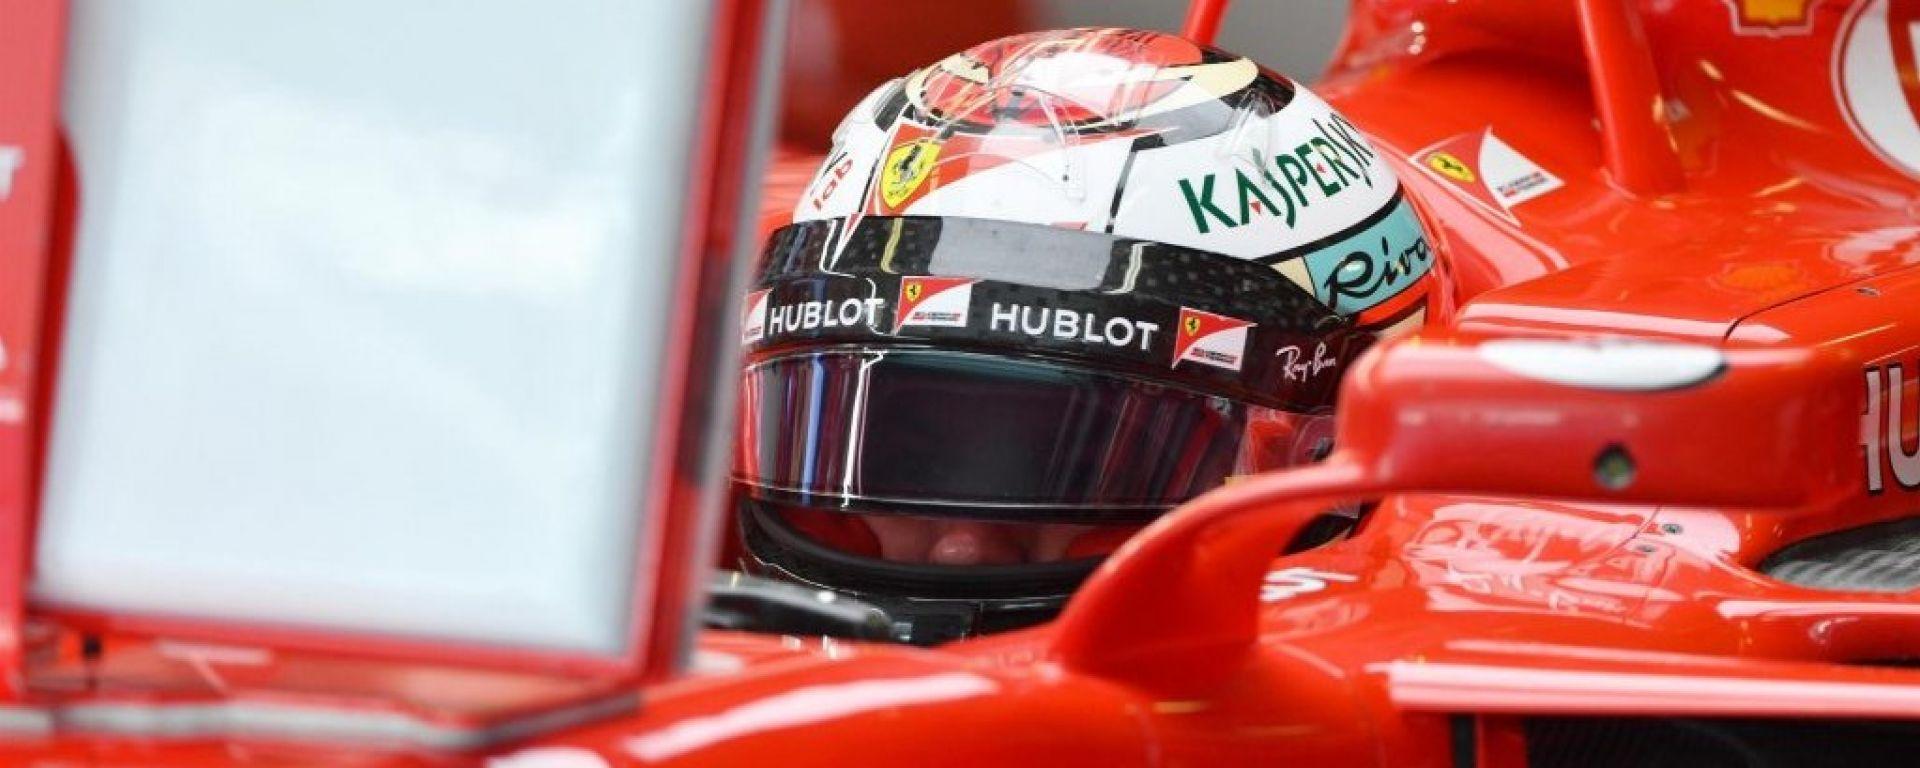 Test Abu Dhabi 2017, Kimi Raikkonen